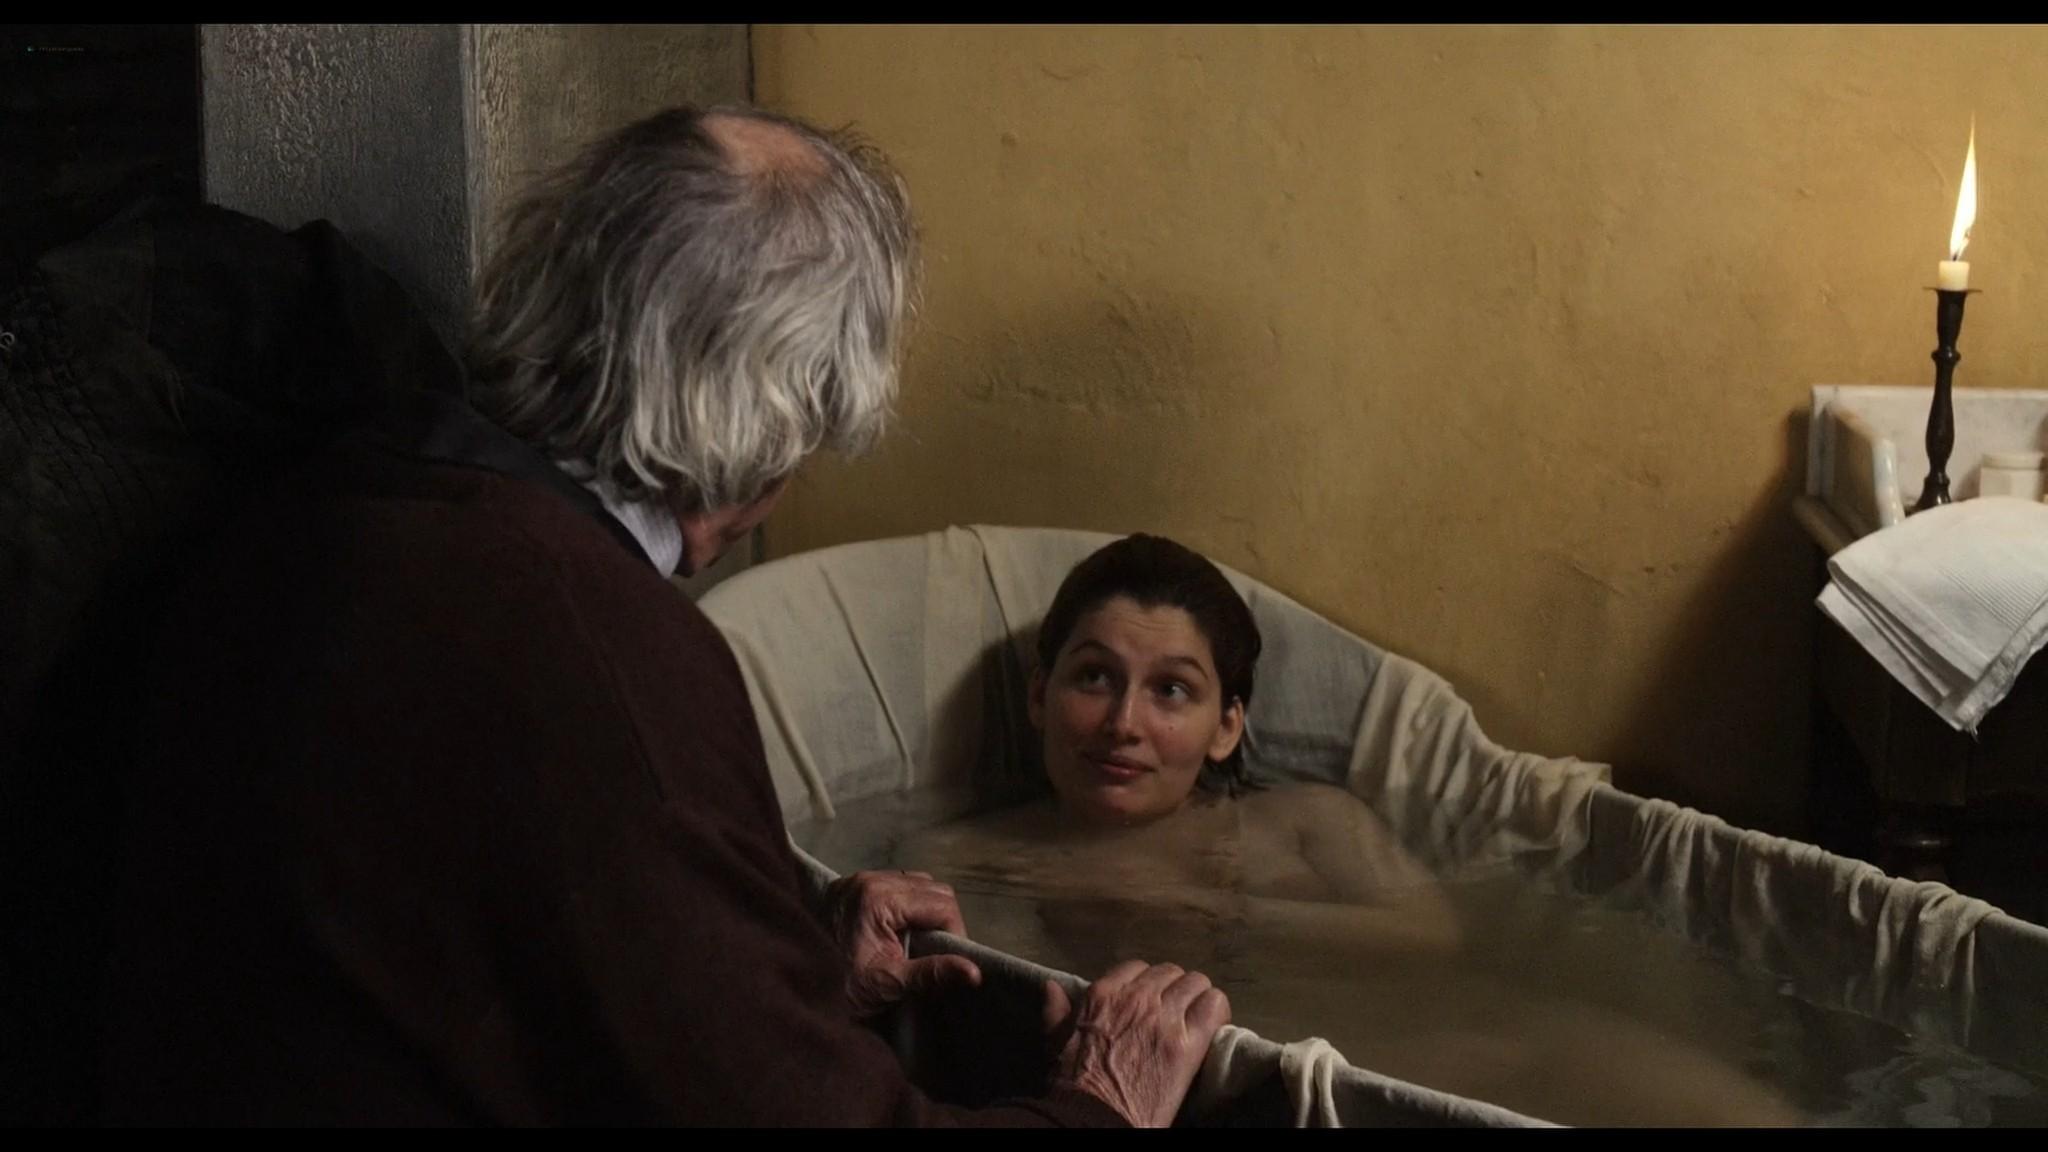 Laetitia Casta nude topless and very hot La jeune fille et les loups 2007 HD 1080p BluRay 10